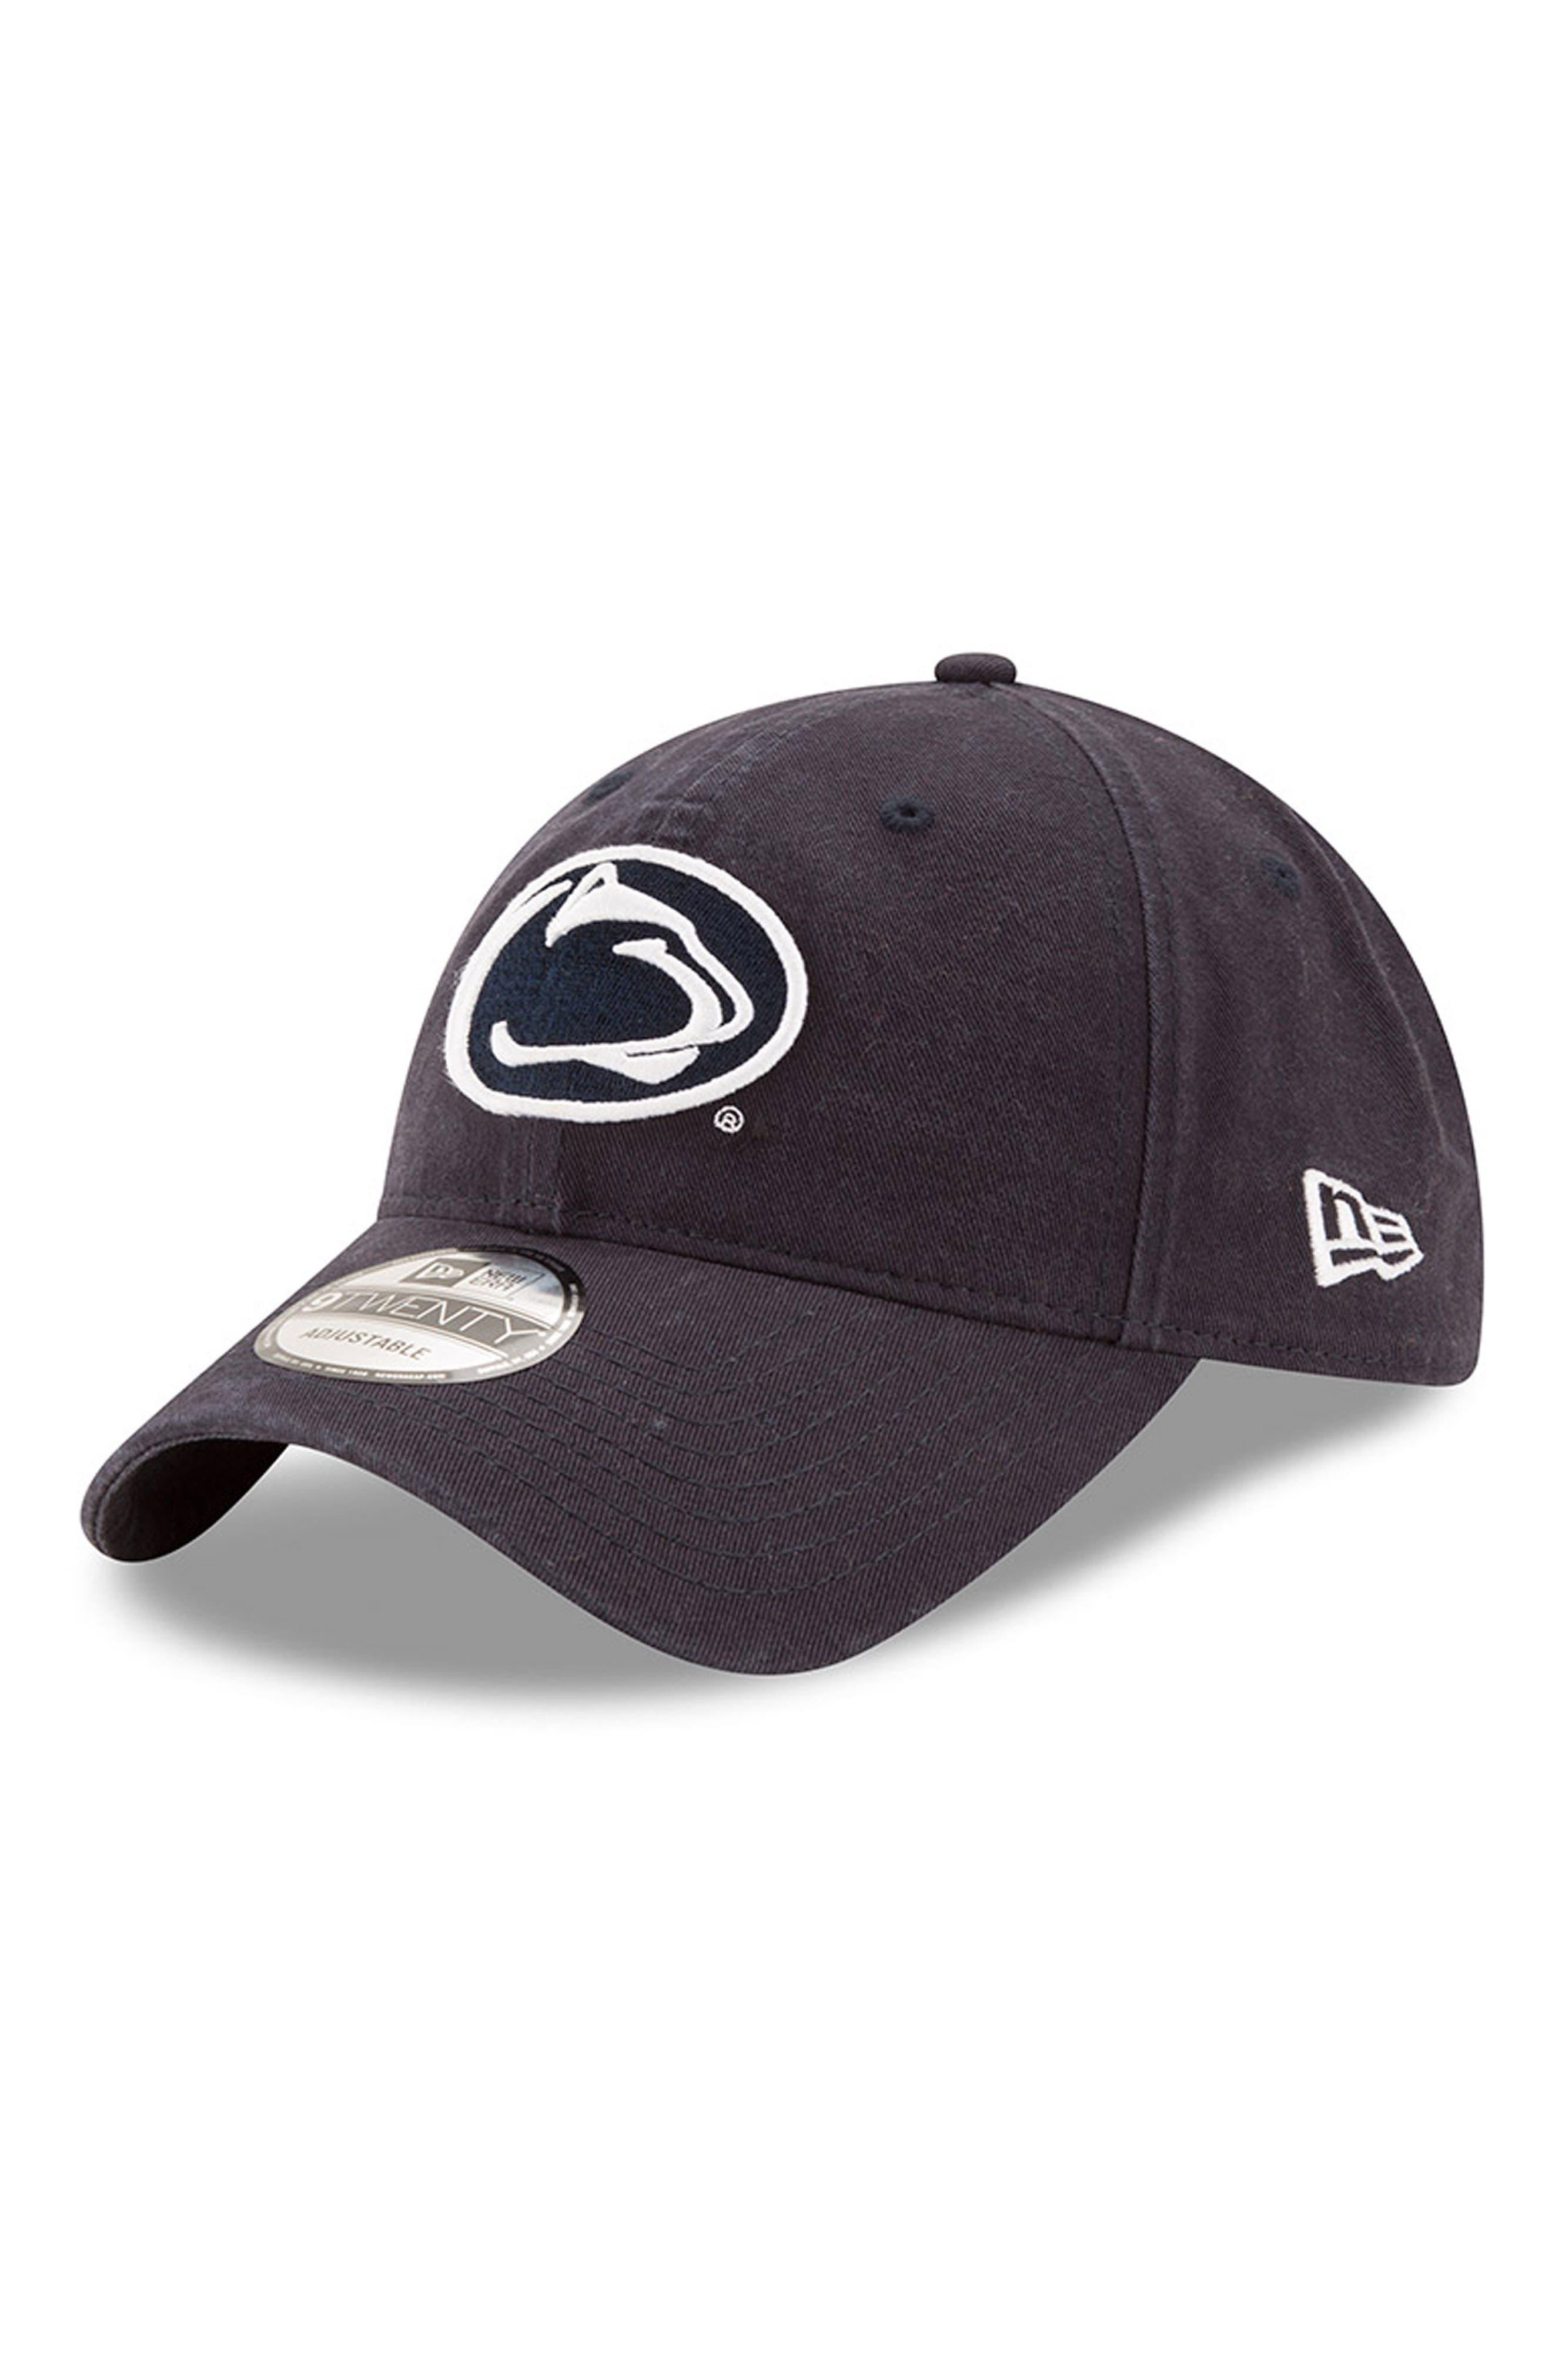 Main Image - New Era Collegiate Core Classic - Penn State Nittany Lions Baseball Cap